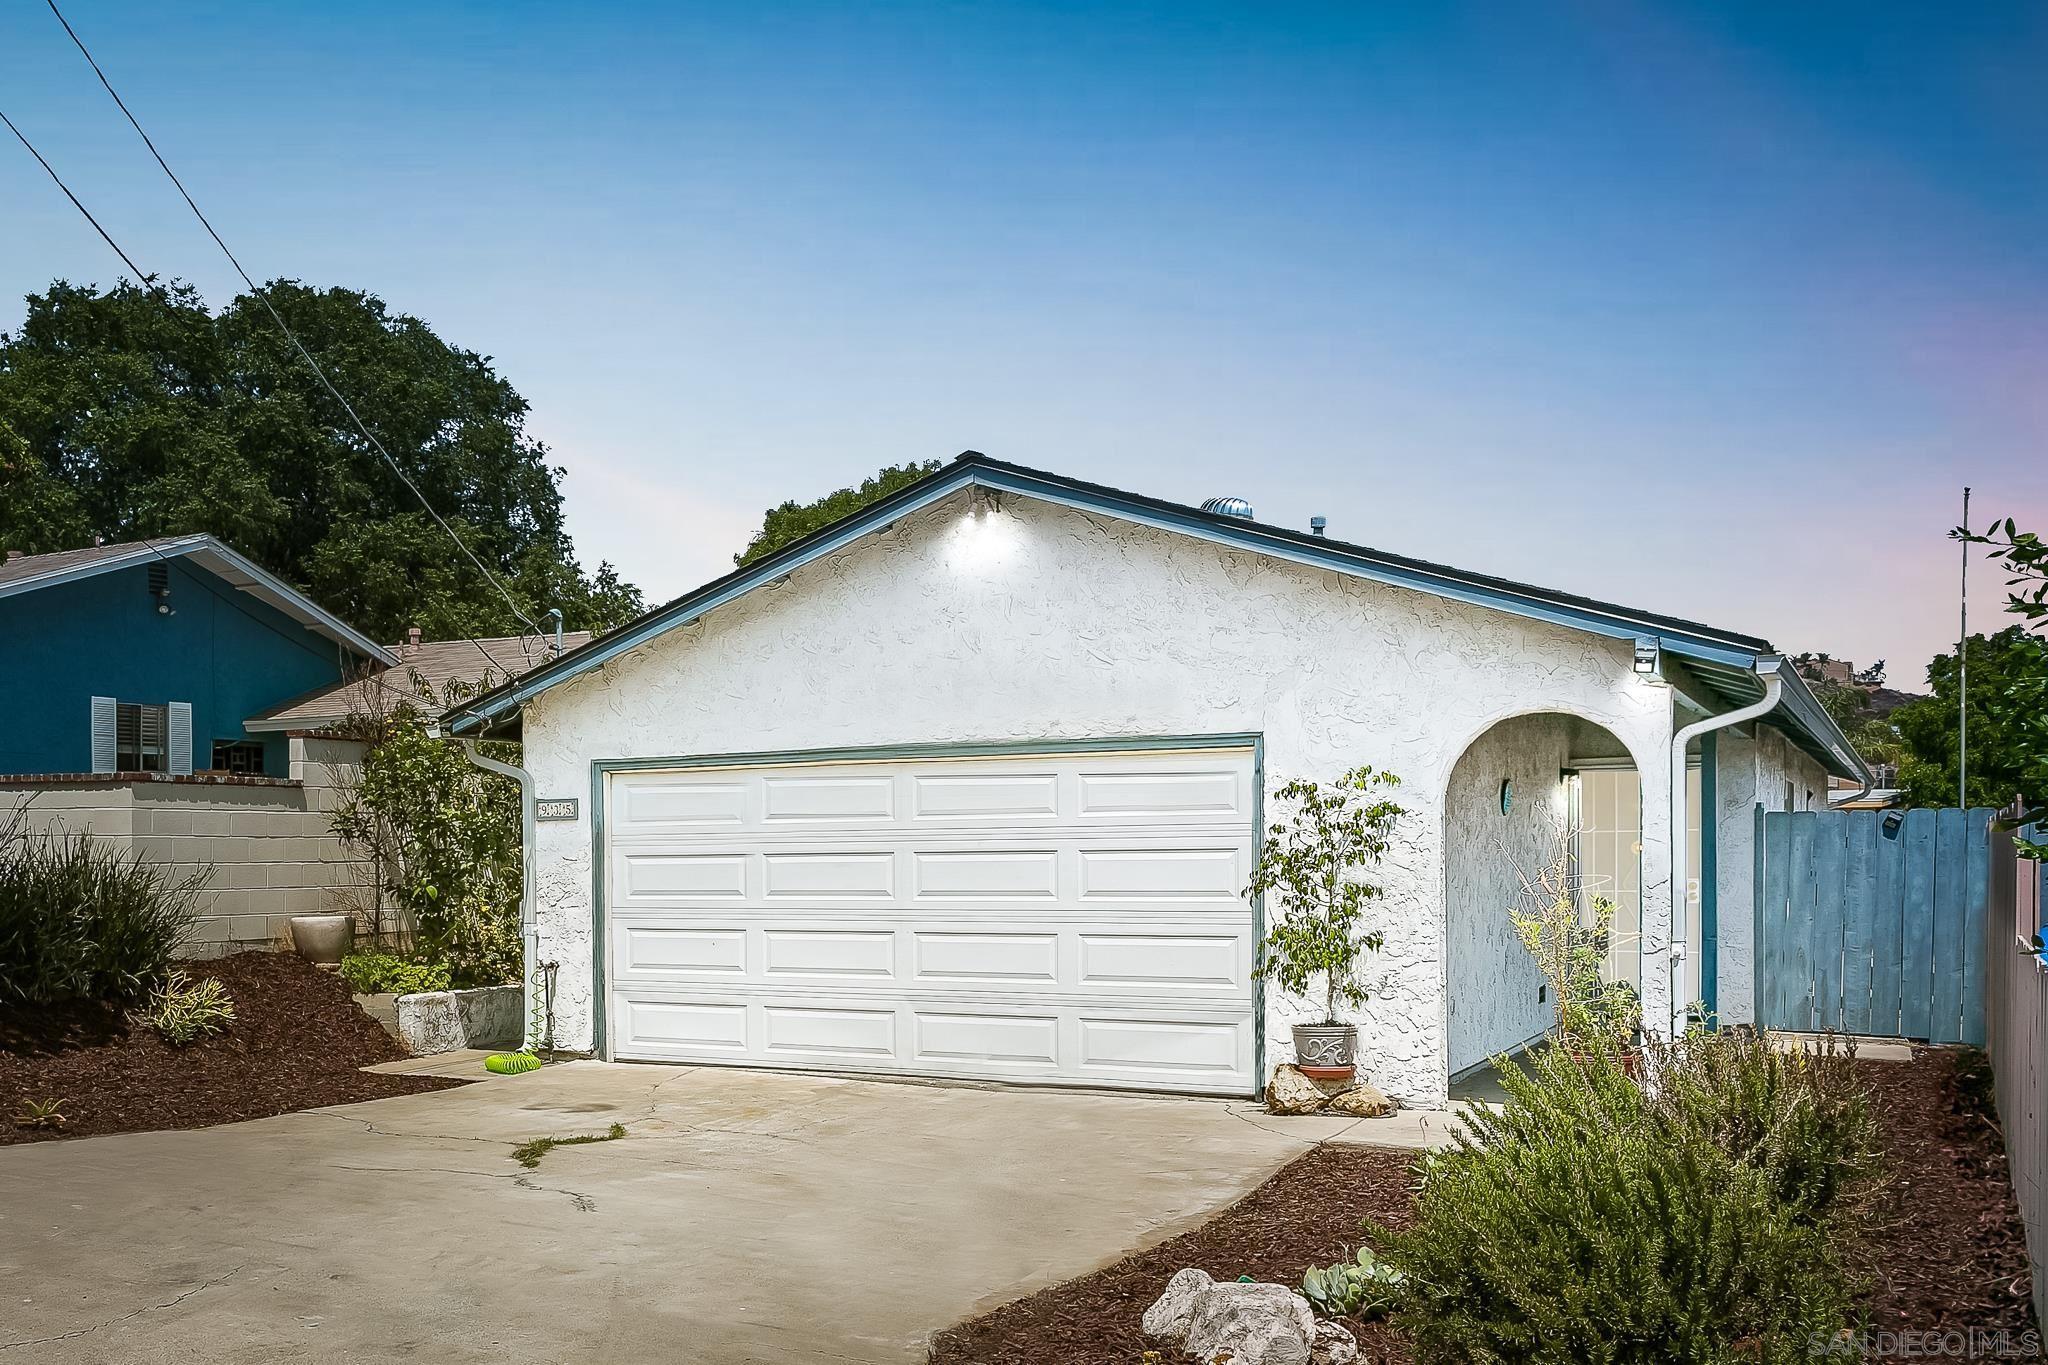 935 Ramona Ave, Spring Valley, CA 91977